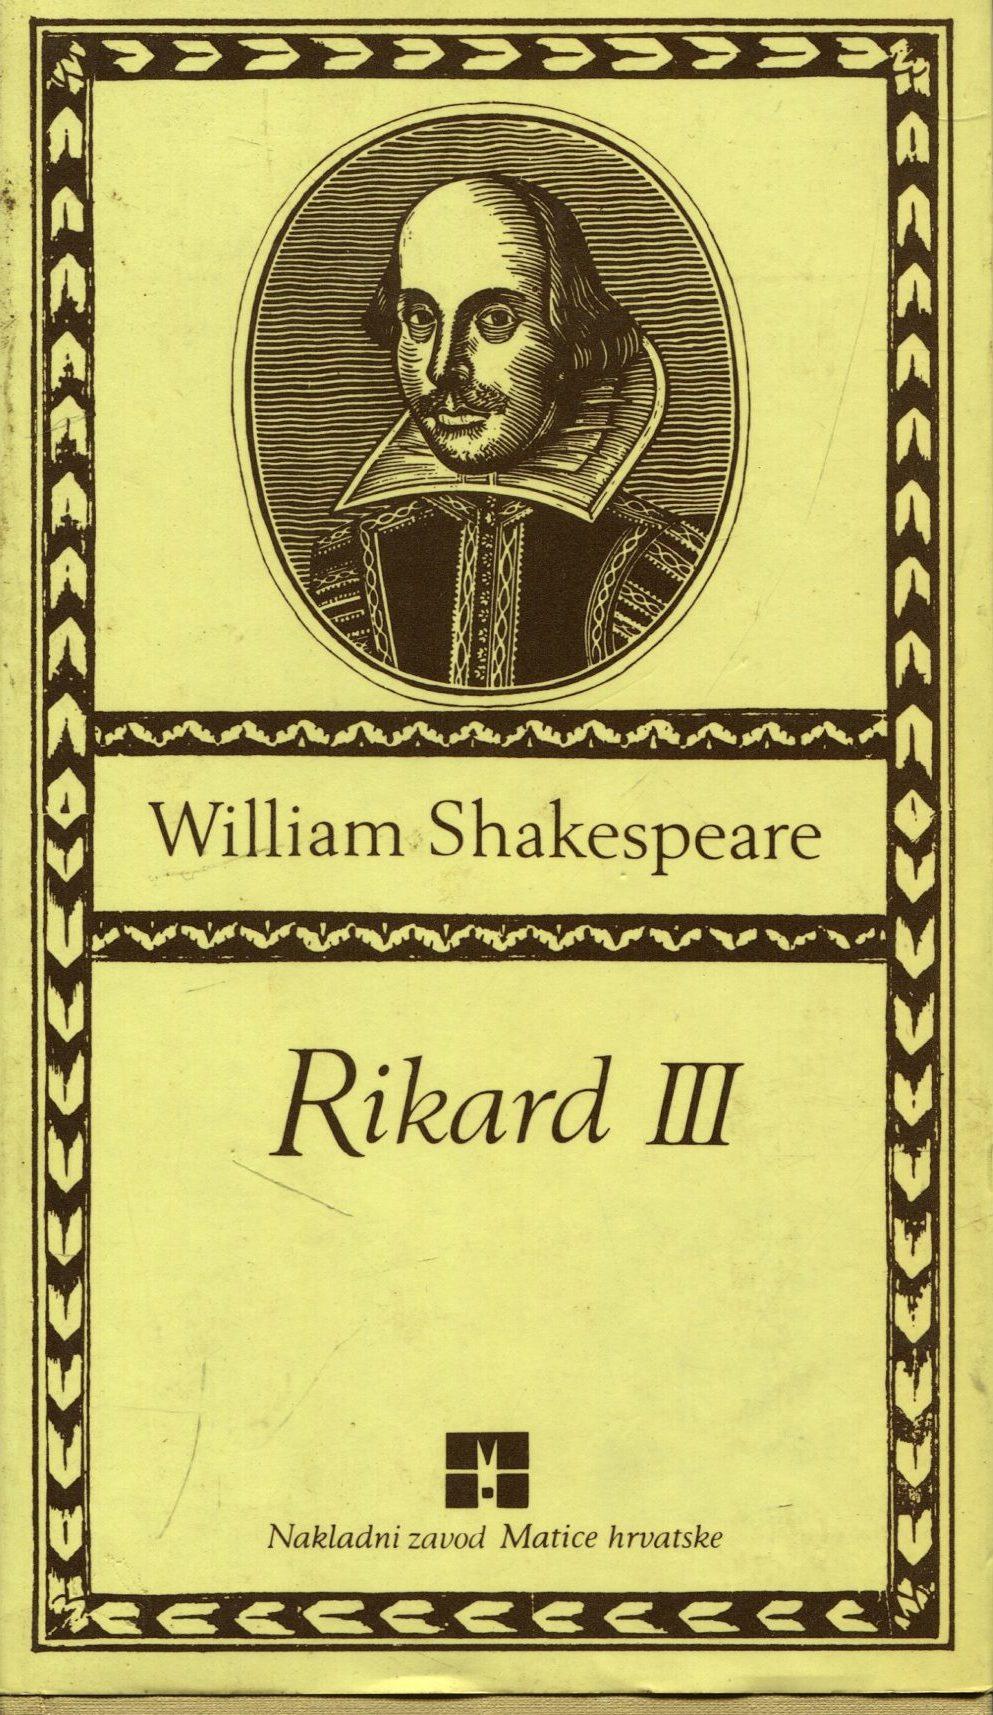 Rikard lll Shakespeare William